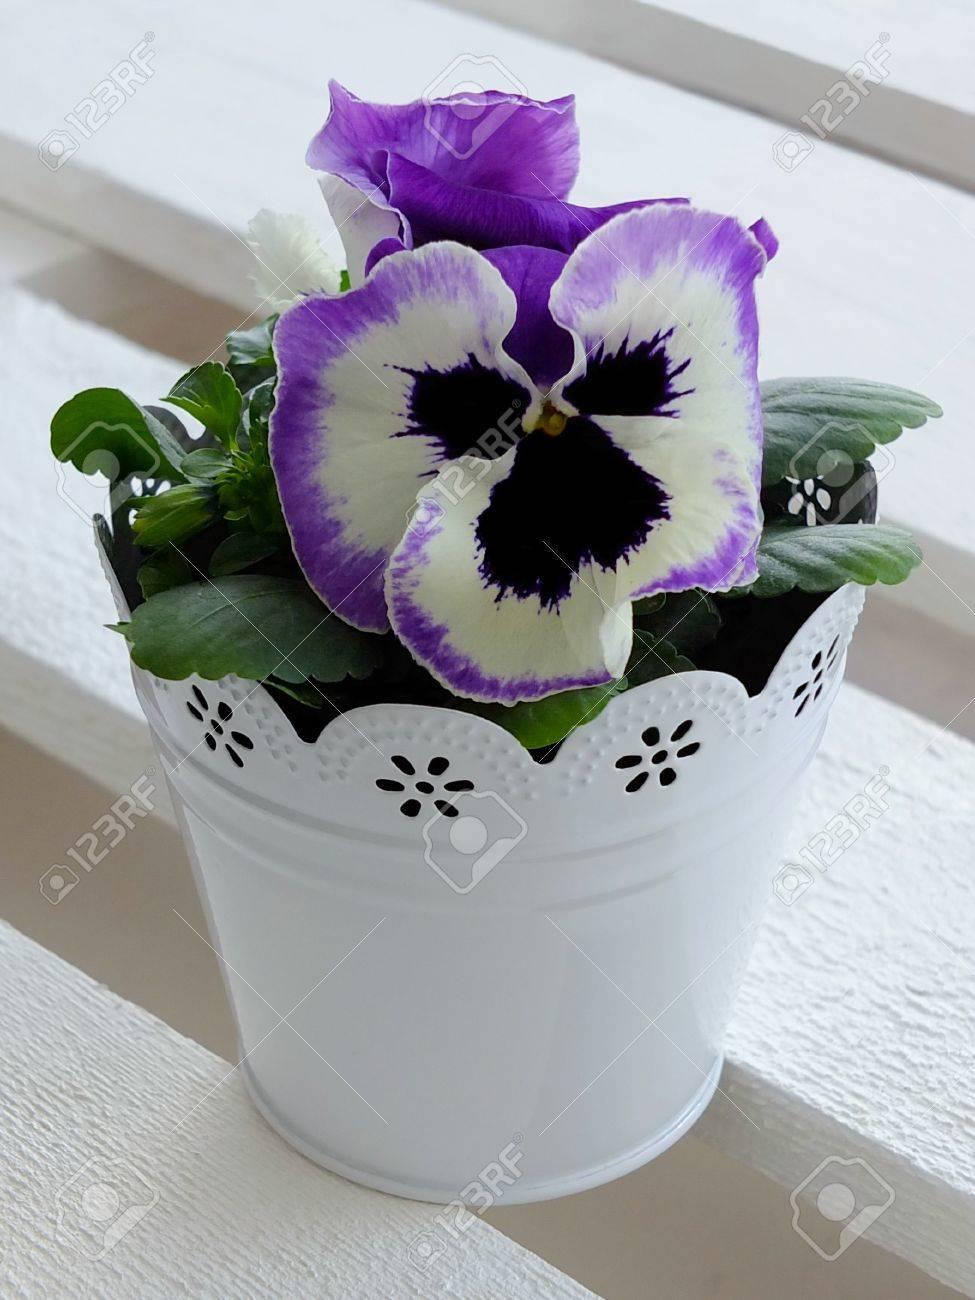 pansies in a flower pot Standard-Bild - 27505894